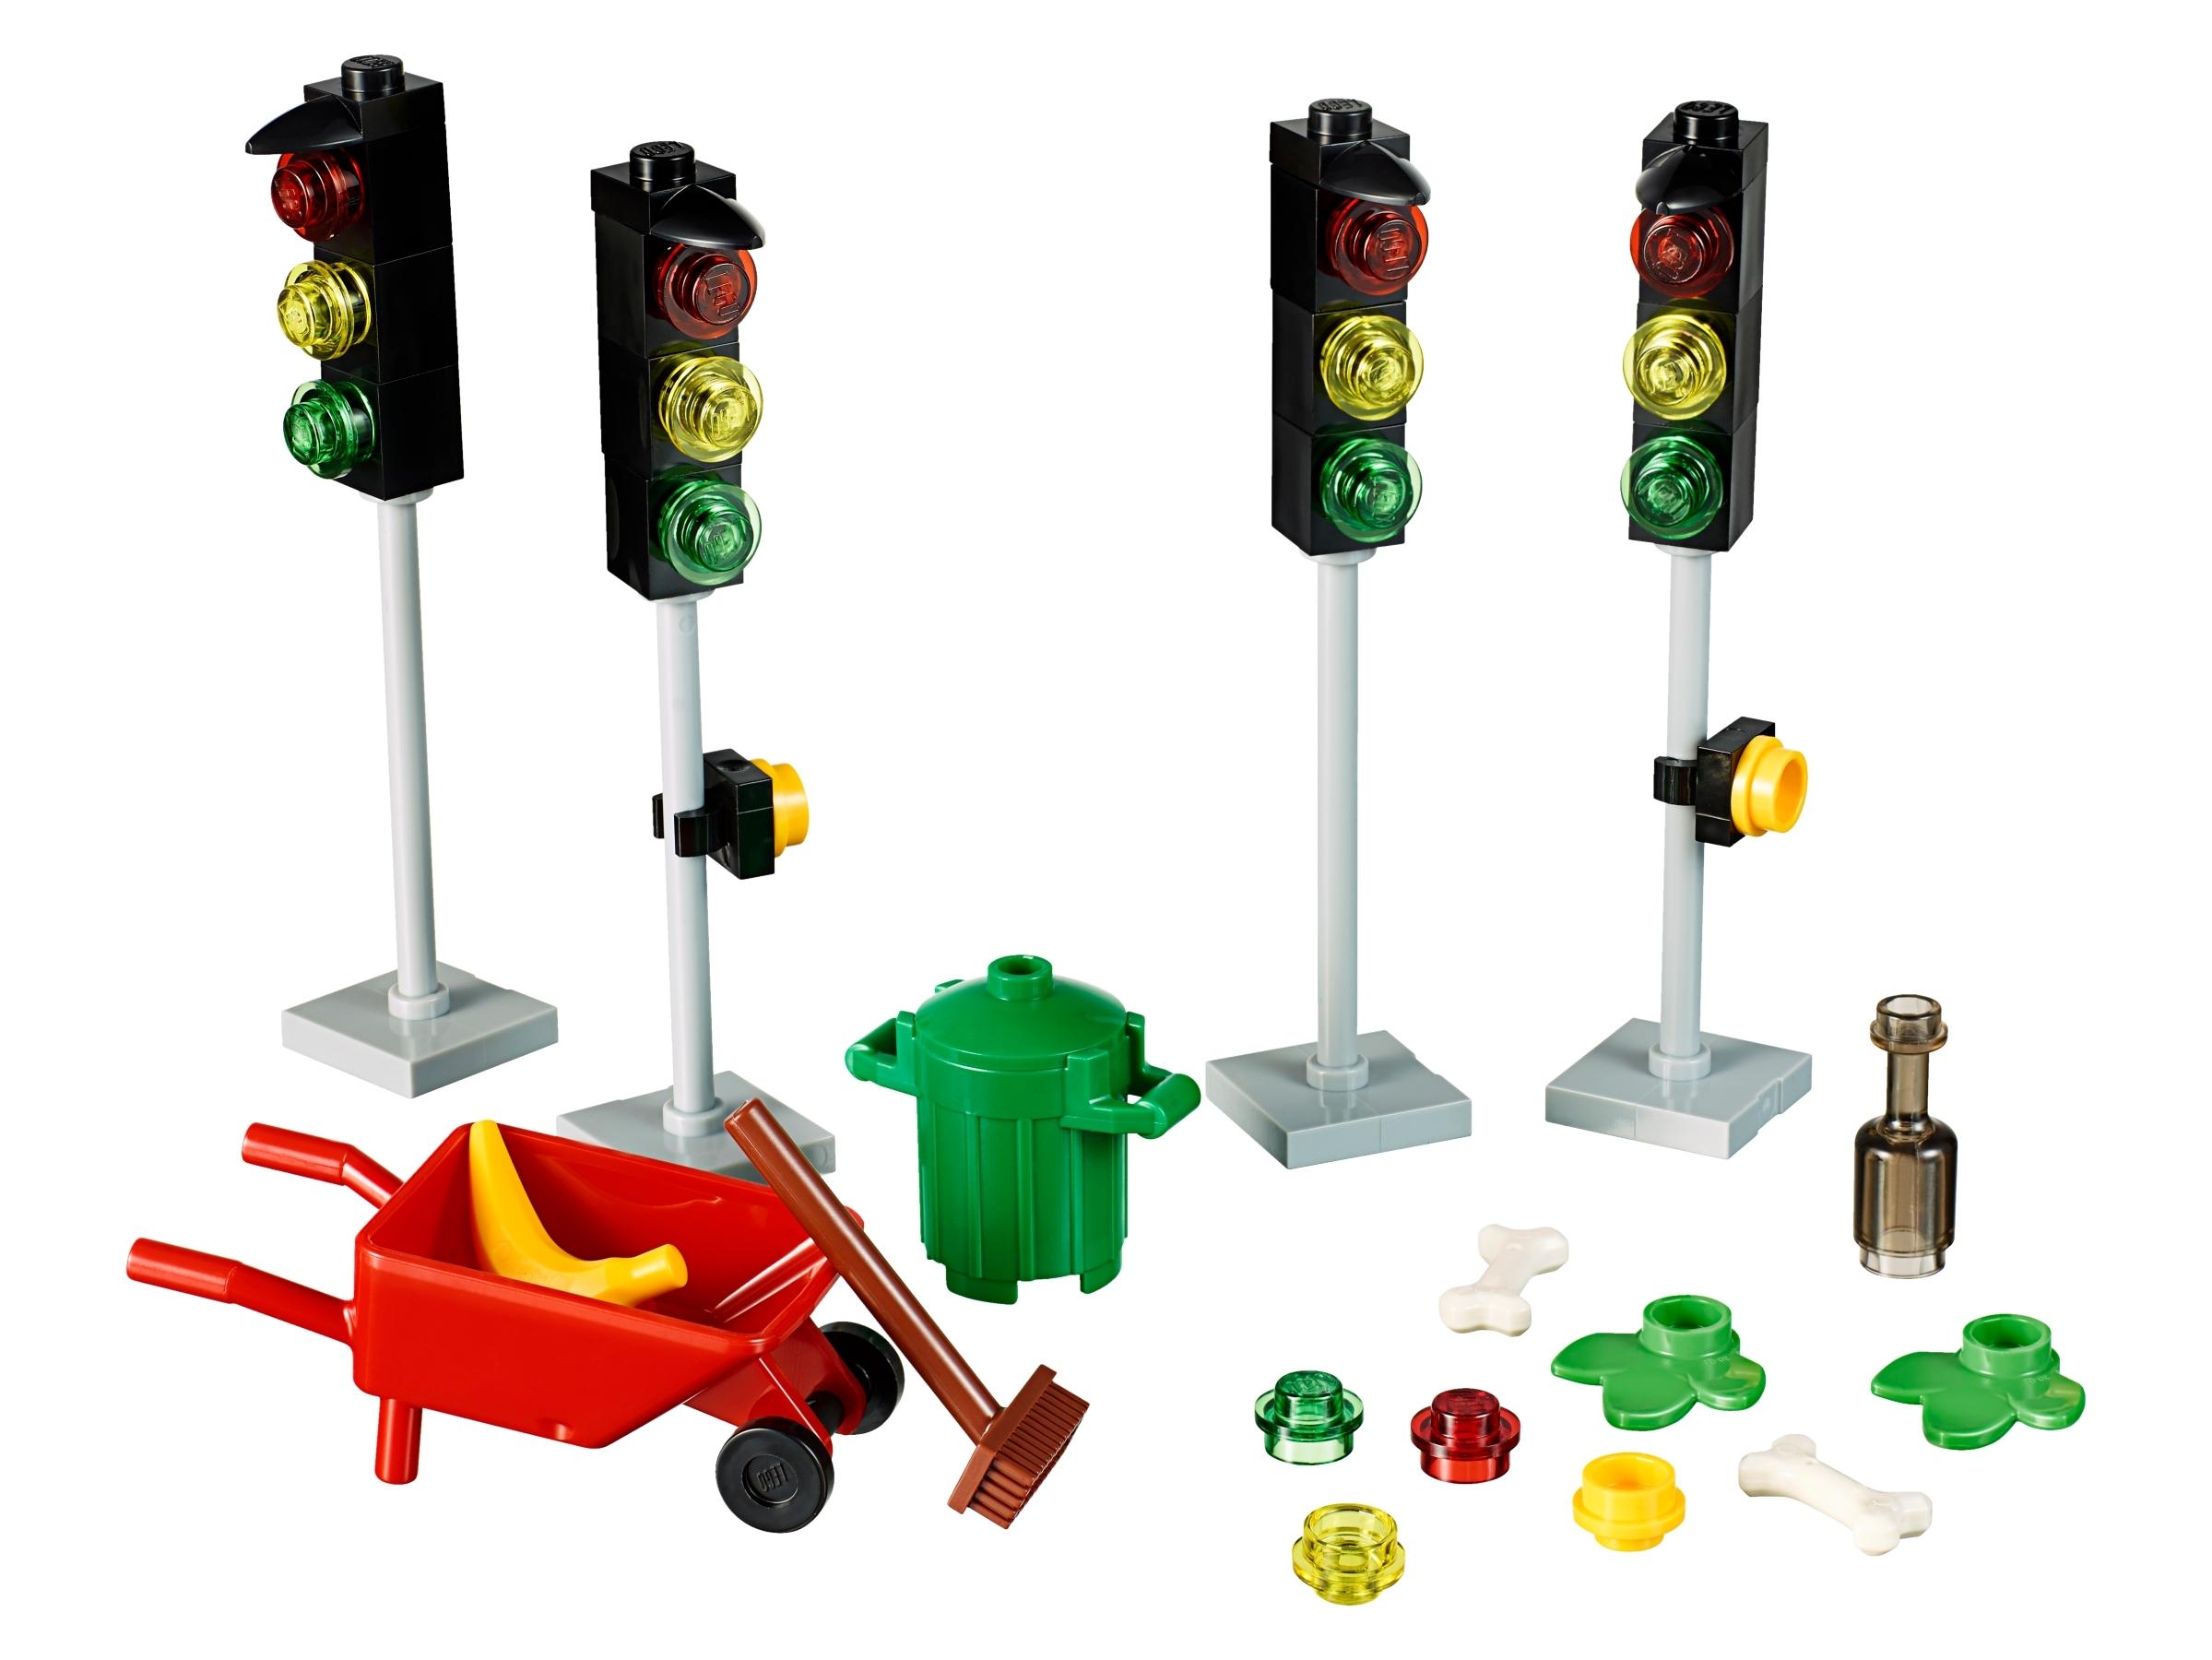 New LEGO Red Friends City Wheelbarrow Minifigure Accessory